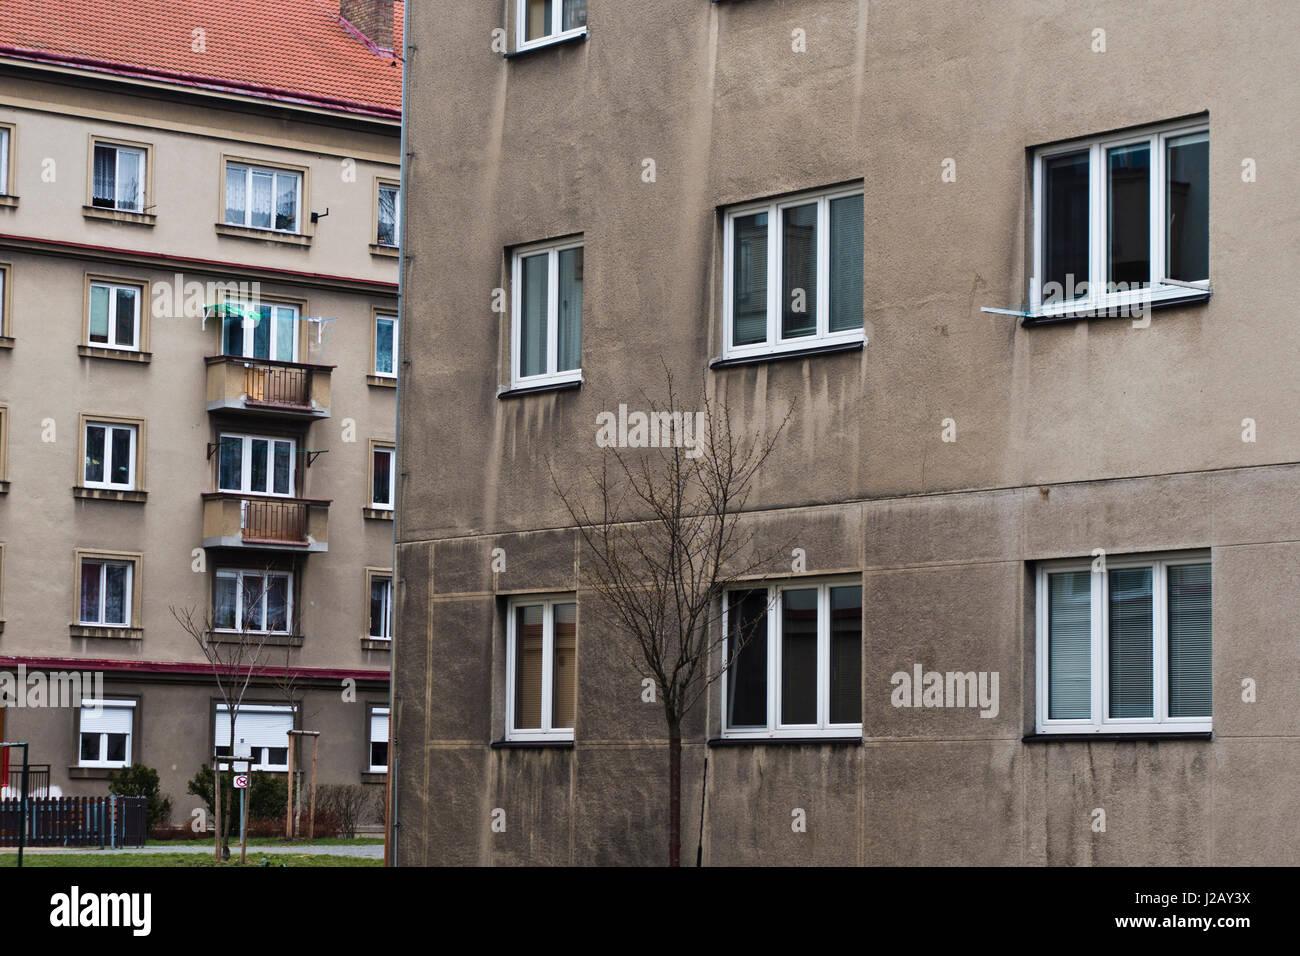 old communist era block of flats buildings - Stock Image